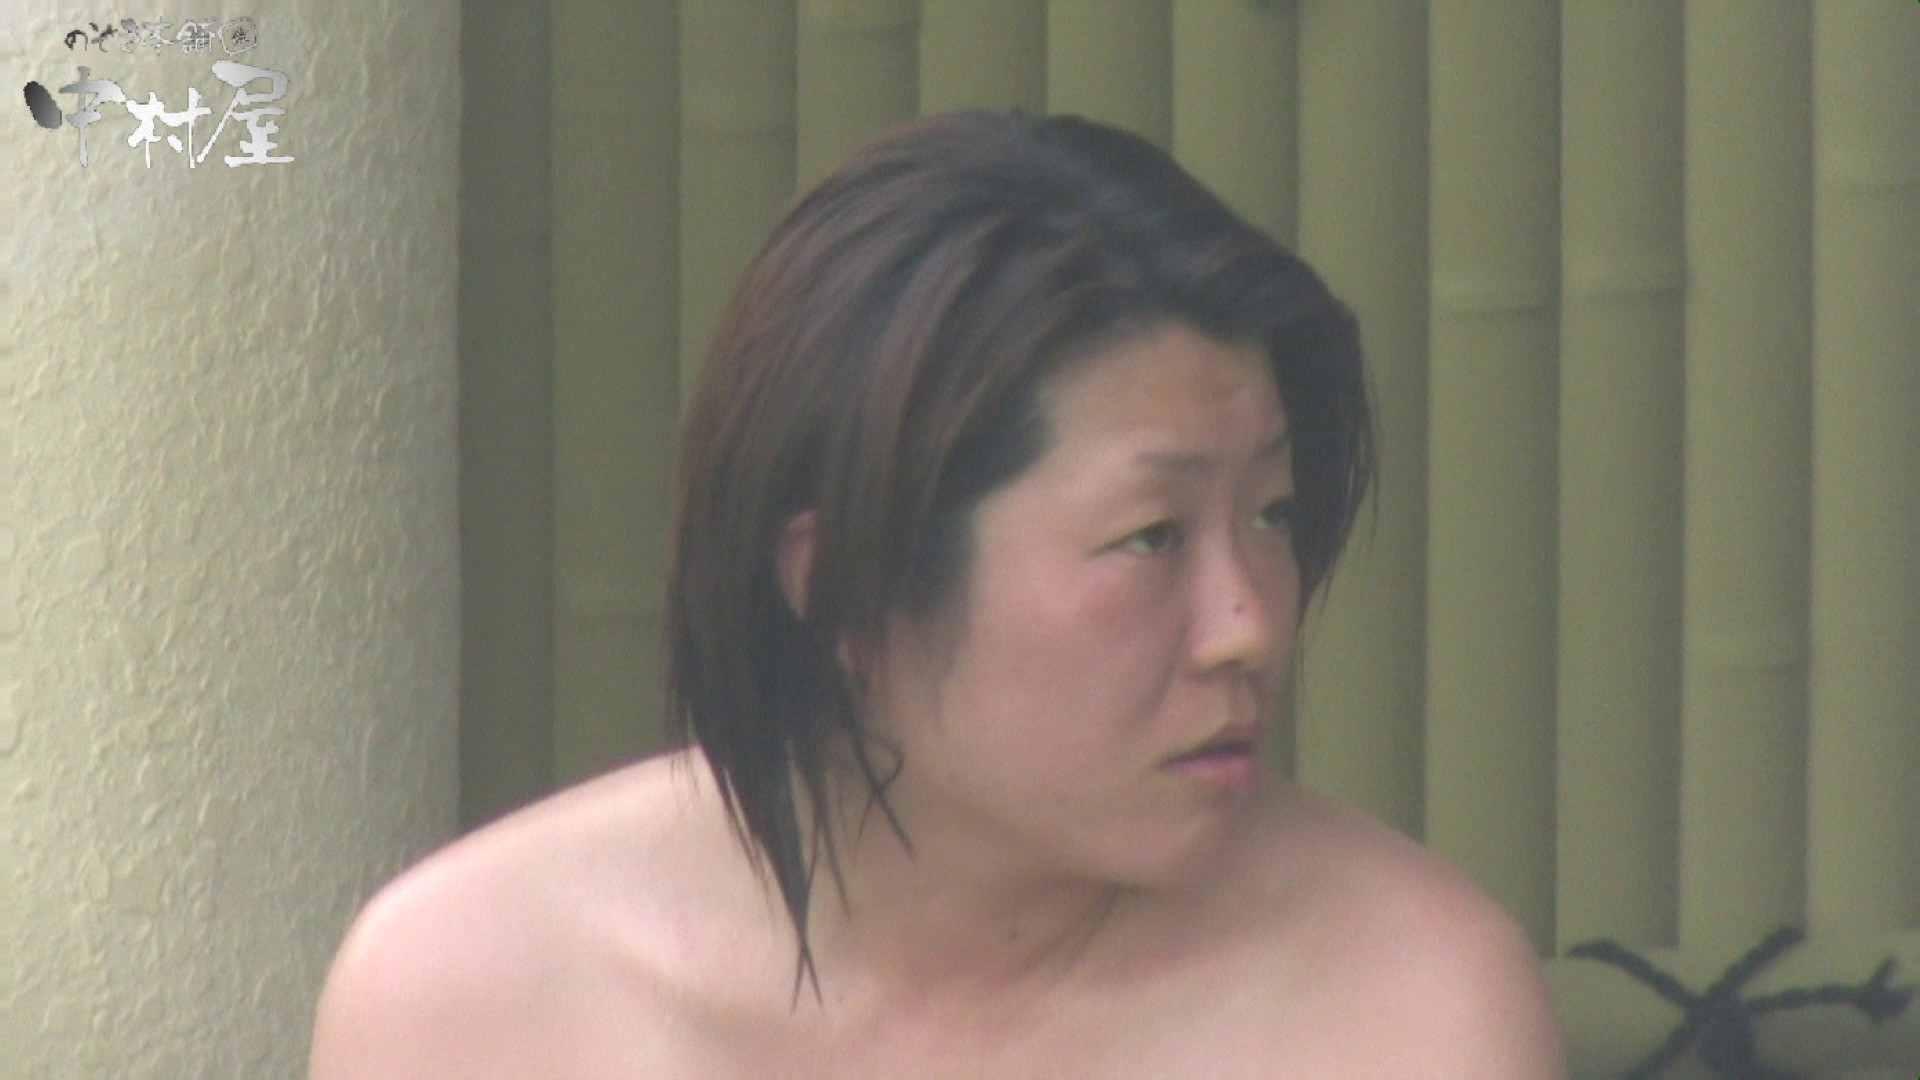 Aquaな露天風呂Vol.885 盗撮 おまんこ動画流出 27連発 5